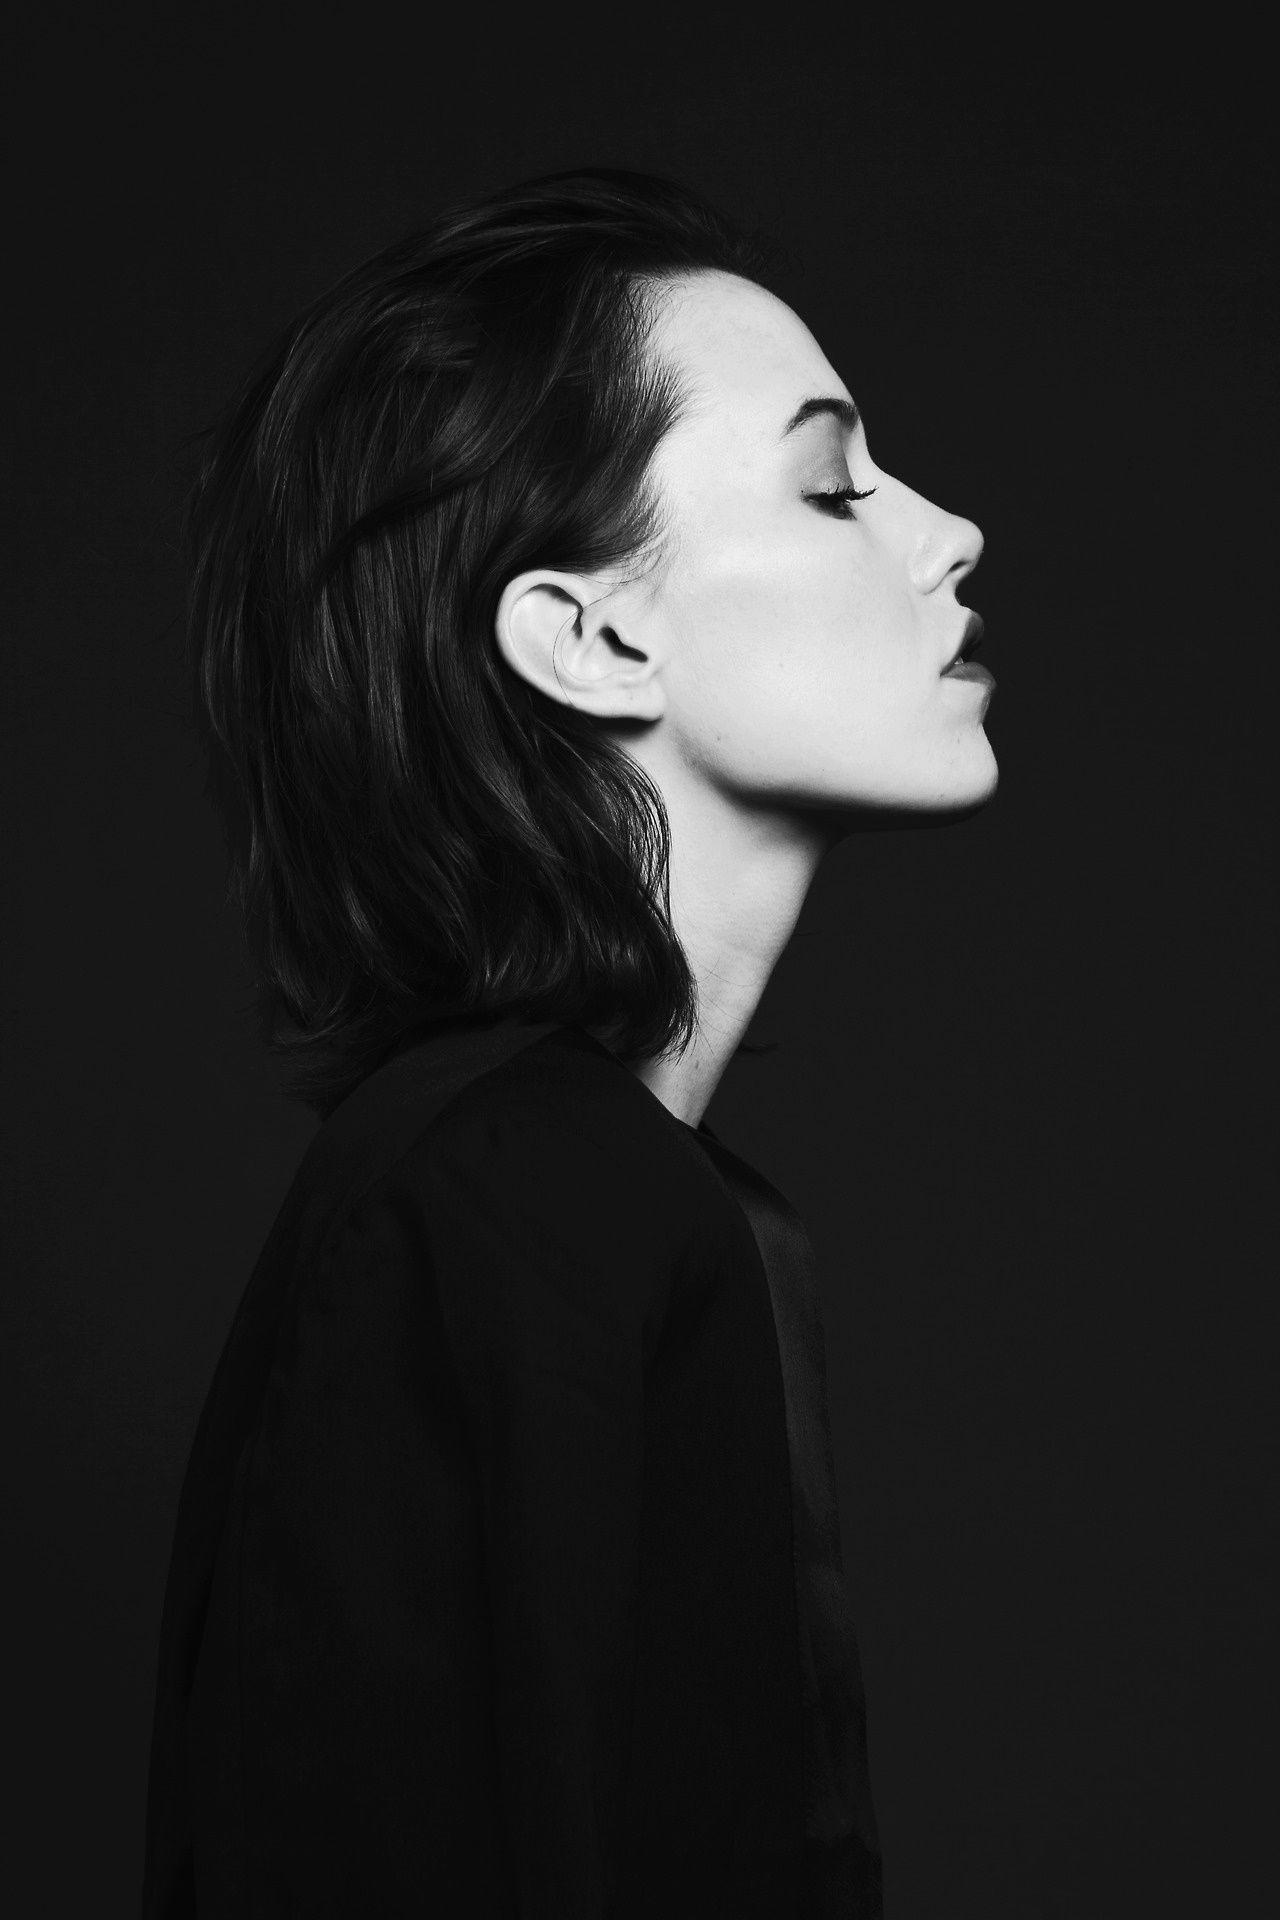 Back Side Girls Profile Pic